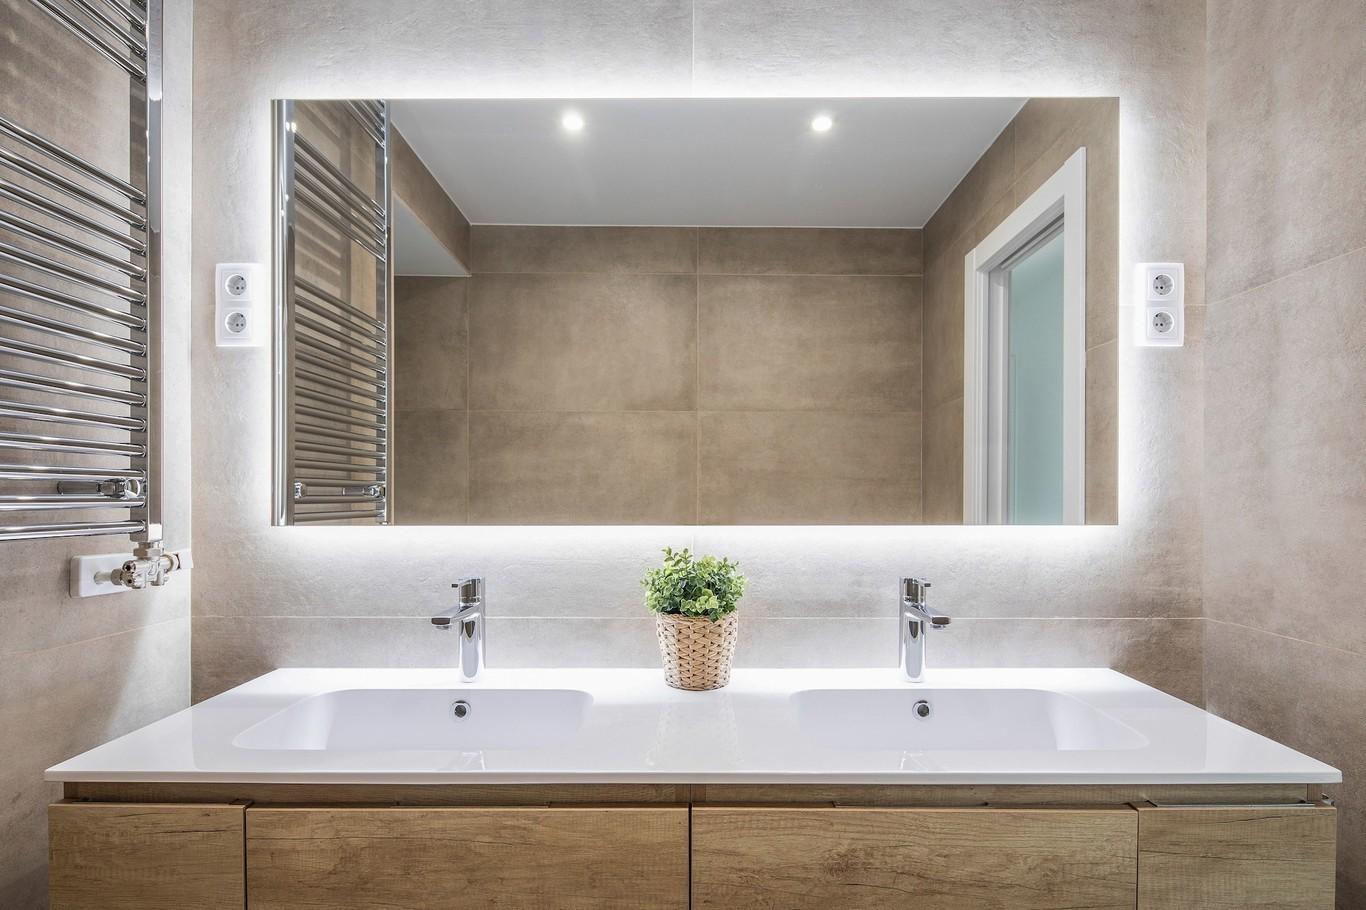 8c015e0b623 ¿Que estilo de baño prefieres? Te damos las claves para que acertar con  cinco estilos diferentes de cuartos de baño